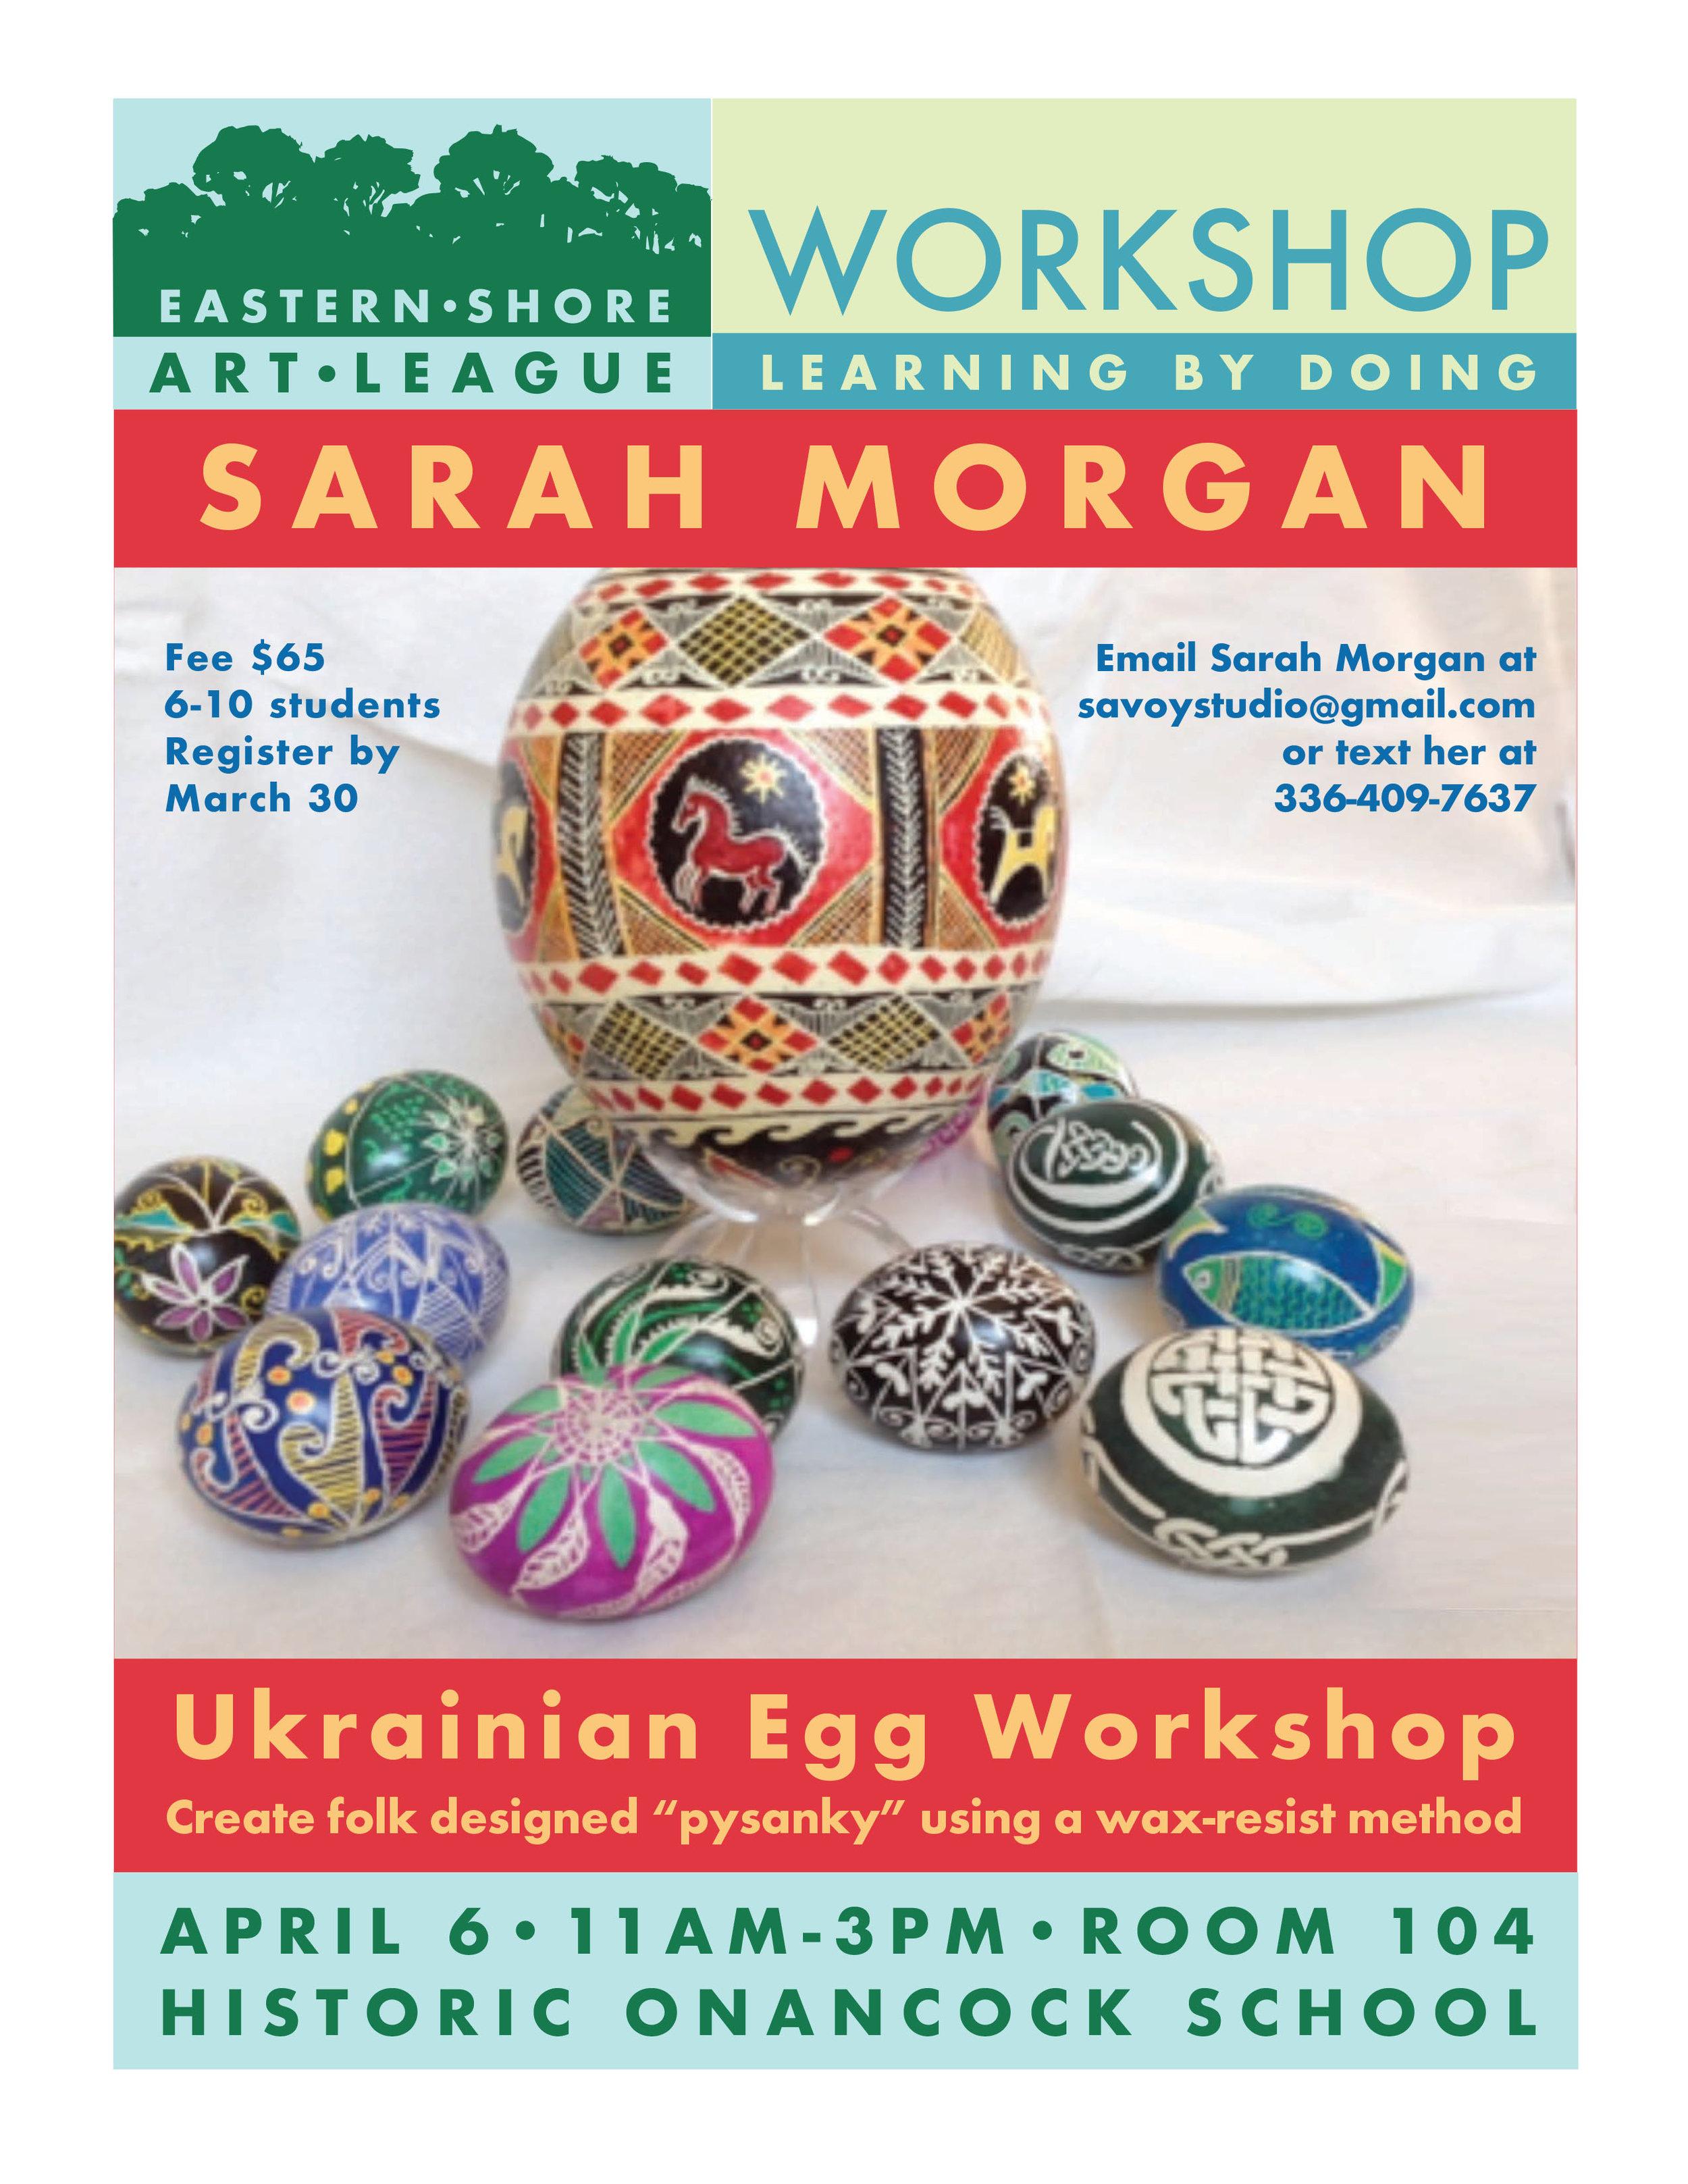 Workshop - Ukranian egg workshop in room 104 of Historic Onancock School.